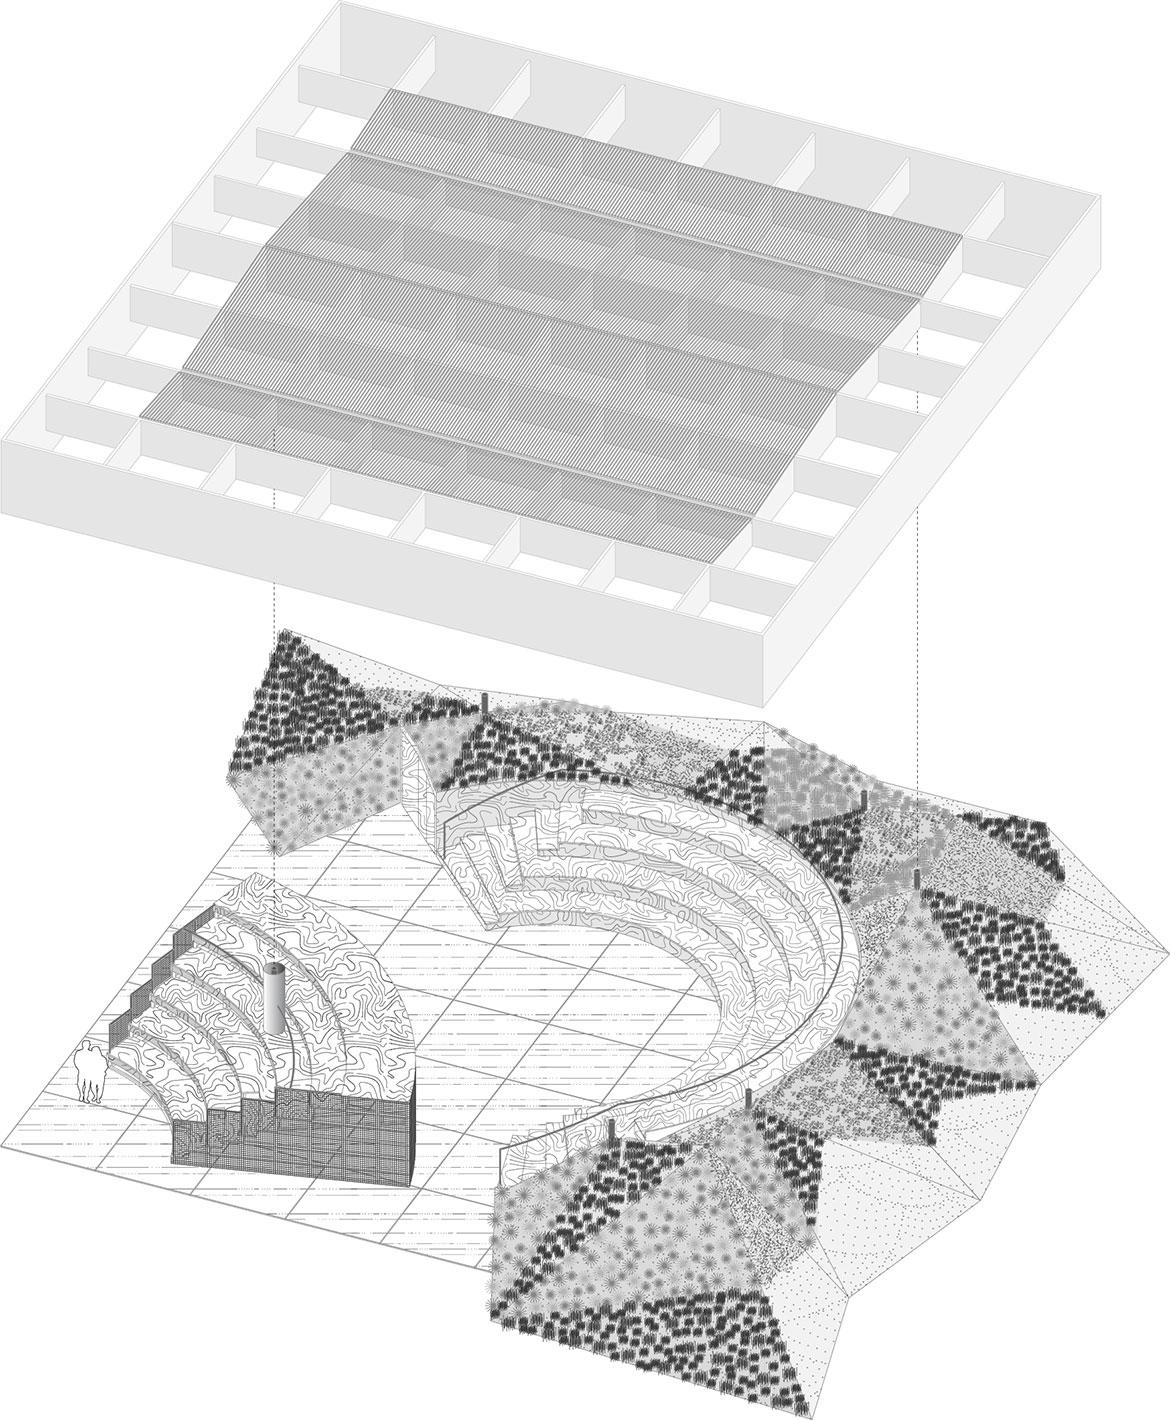 MPavilion Amphitheatre OMA